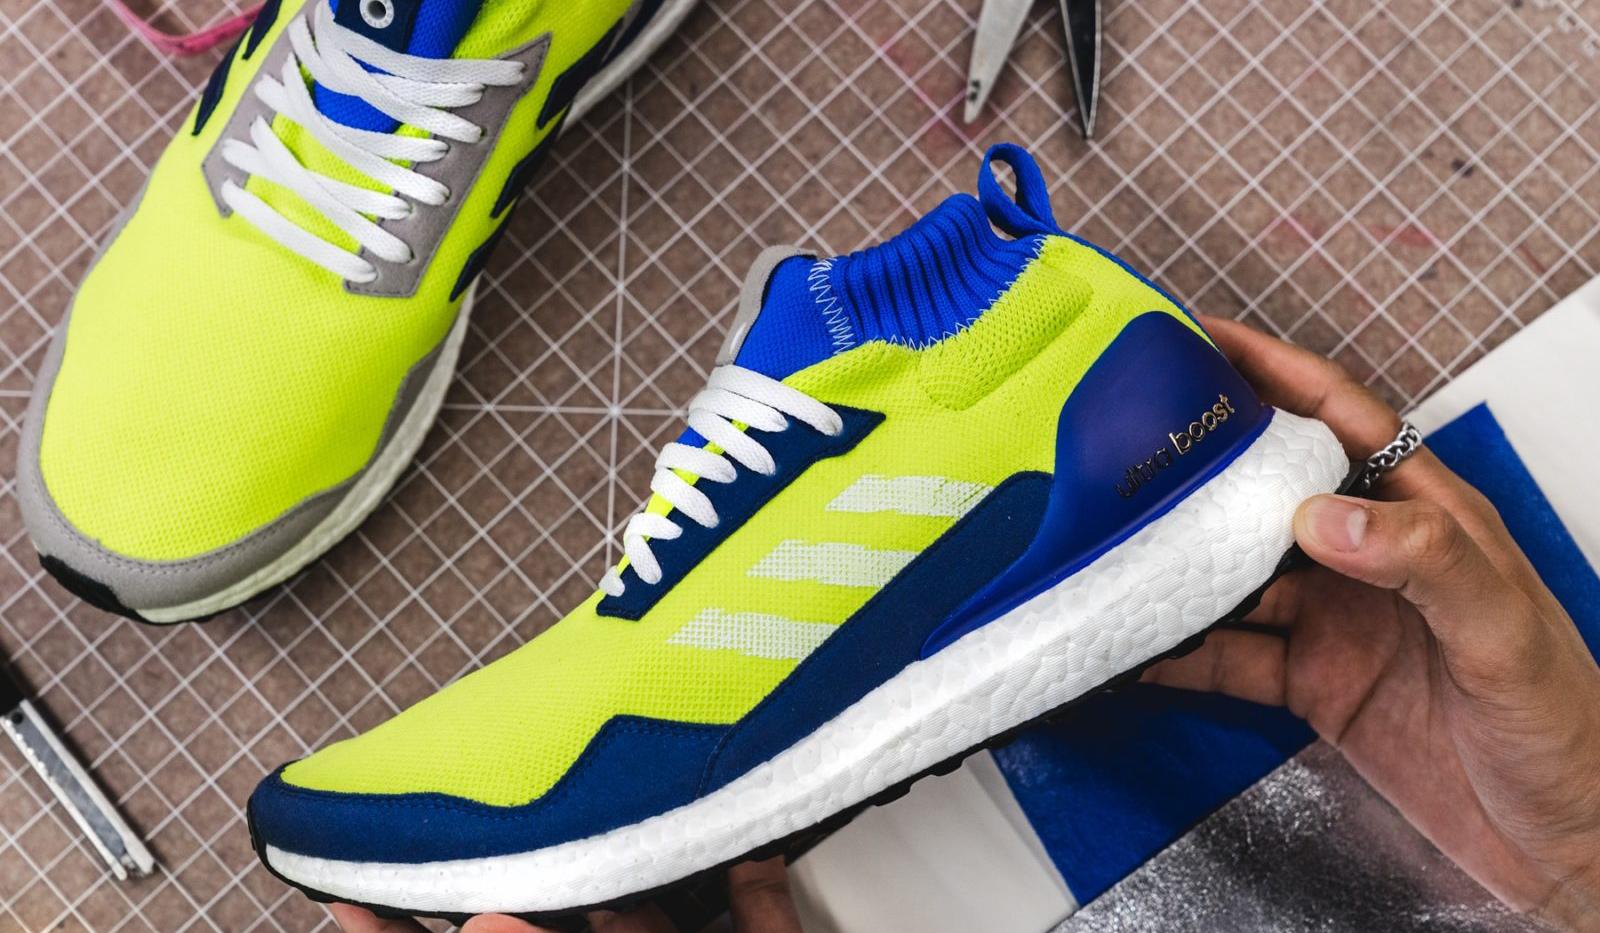 adidas-consortium-ultraboost-mid-prototype-11-1600x1067